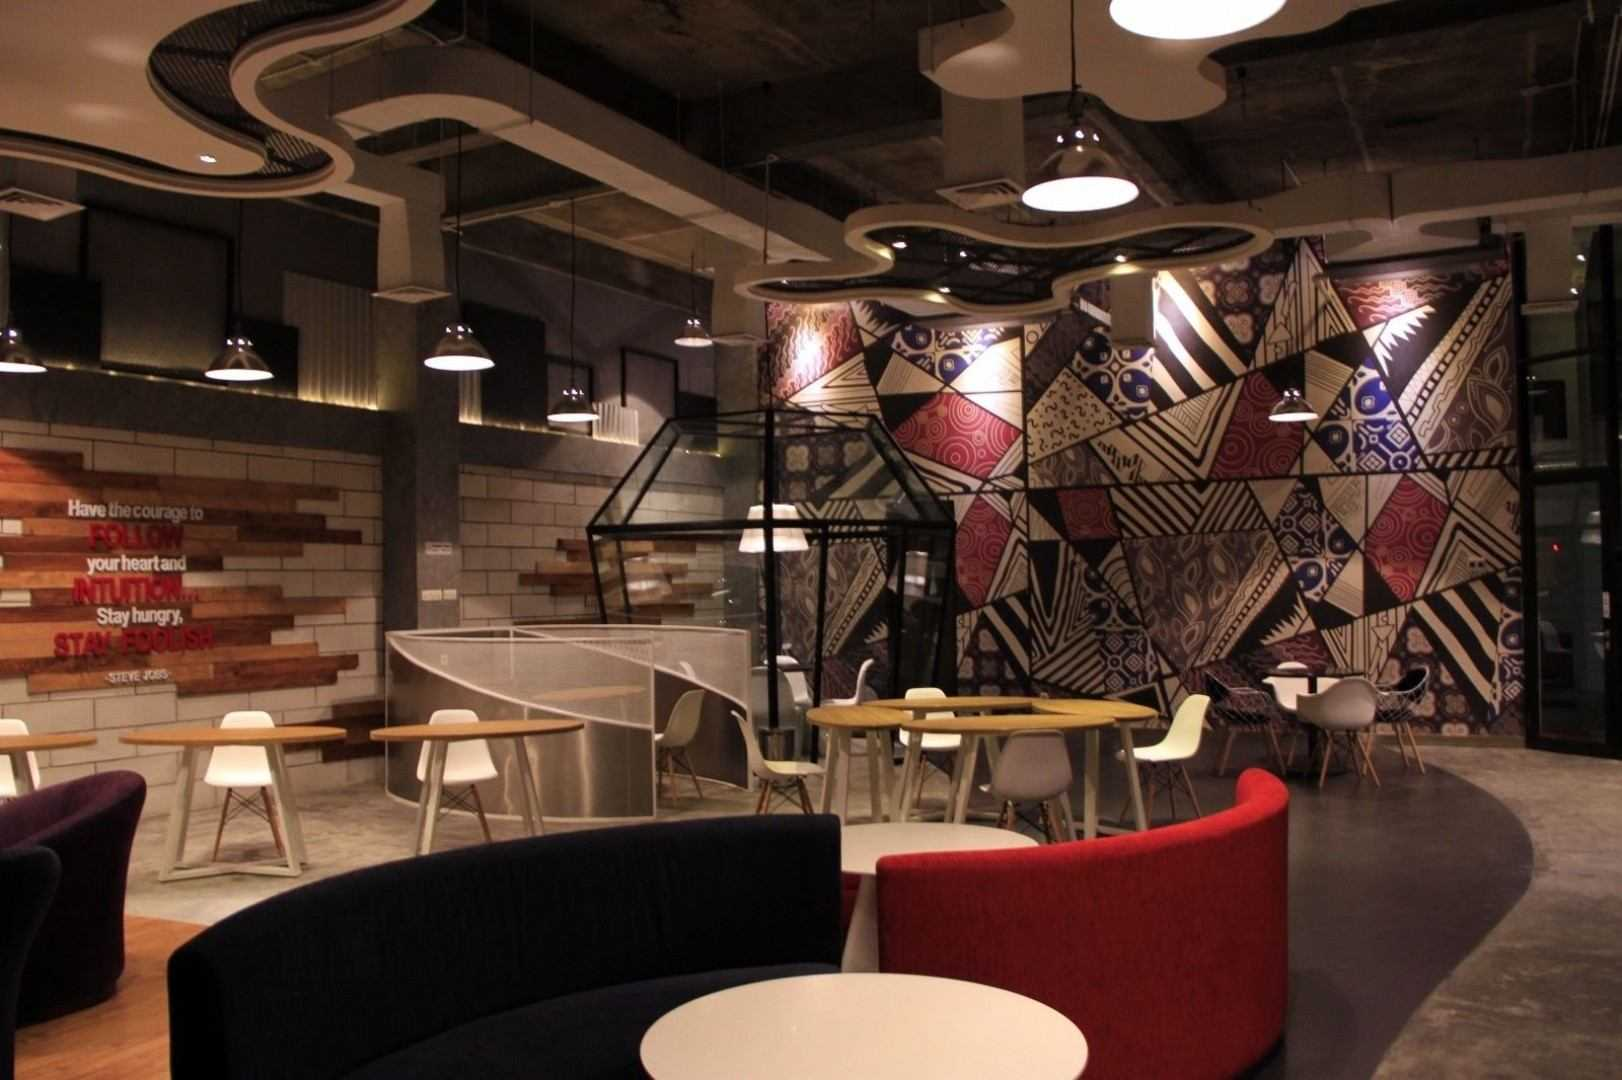 Kottagaris Interior Design Consultant Pt. Kreasi Teknologi Solusindo Surabaya, Kota Sby, Jawa Timur, Indonesia Surabaya, Kota Sby, Jawa Timur, Indonesia Seating Area Office   54624